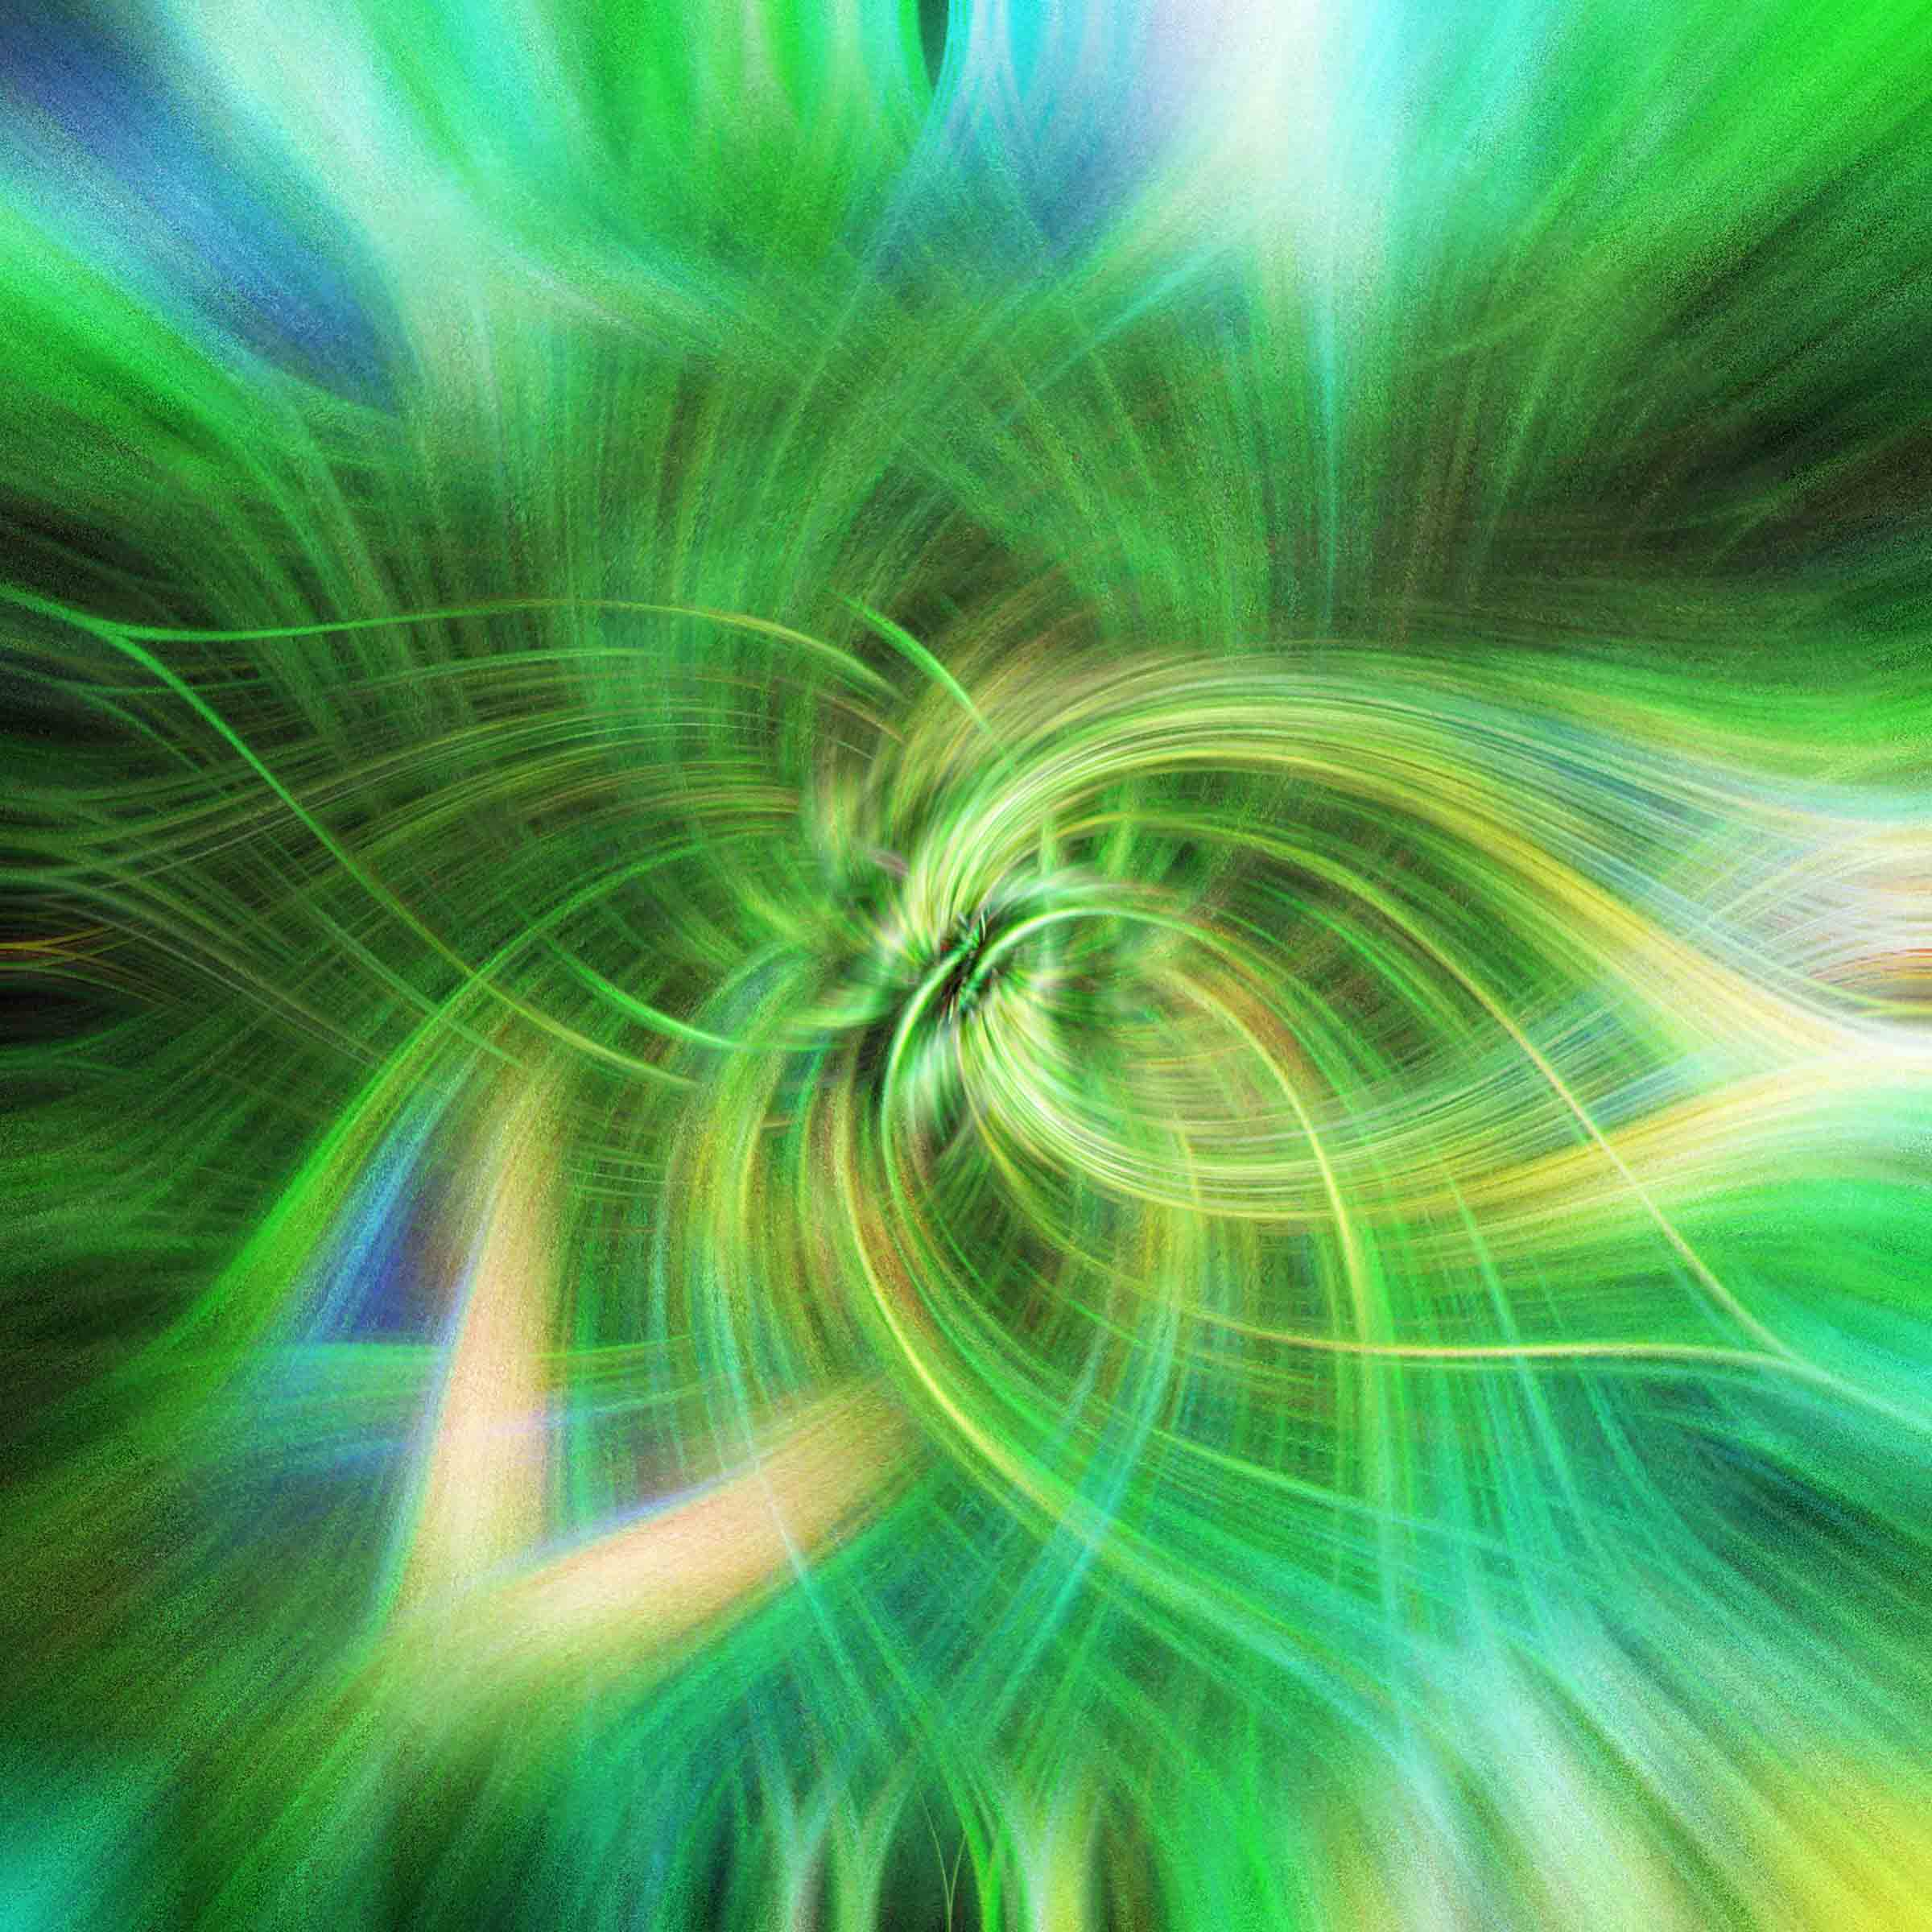 Green twirl effect image